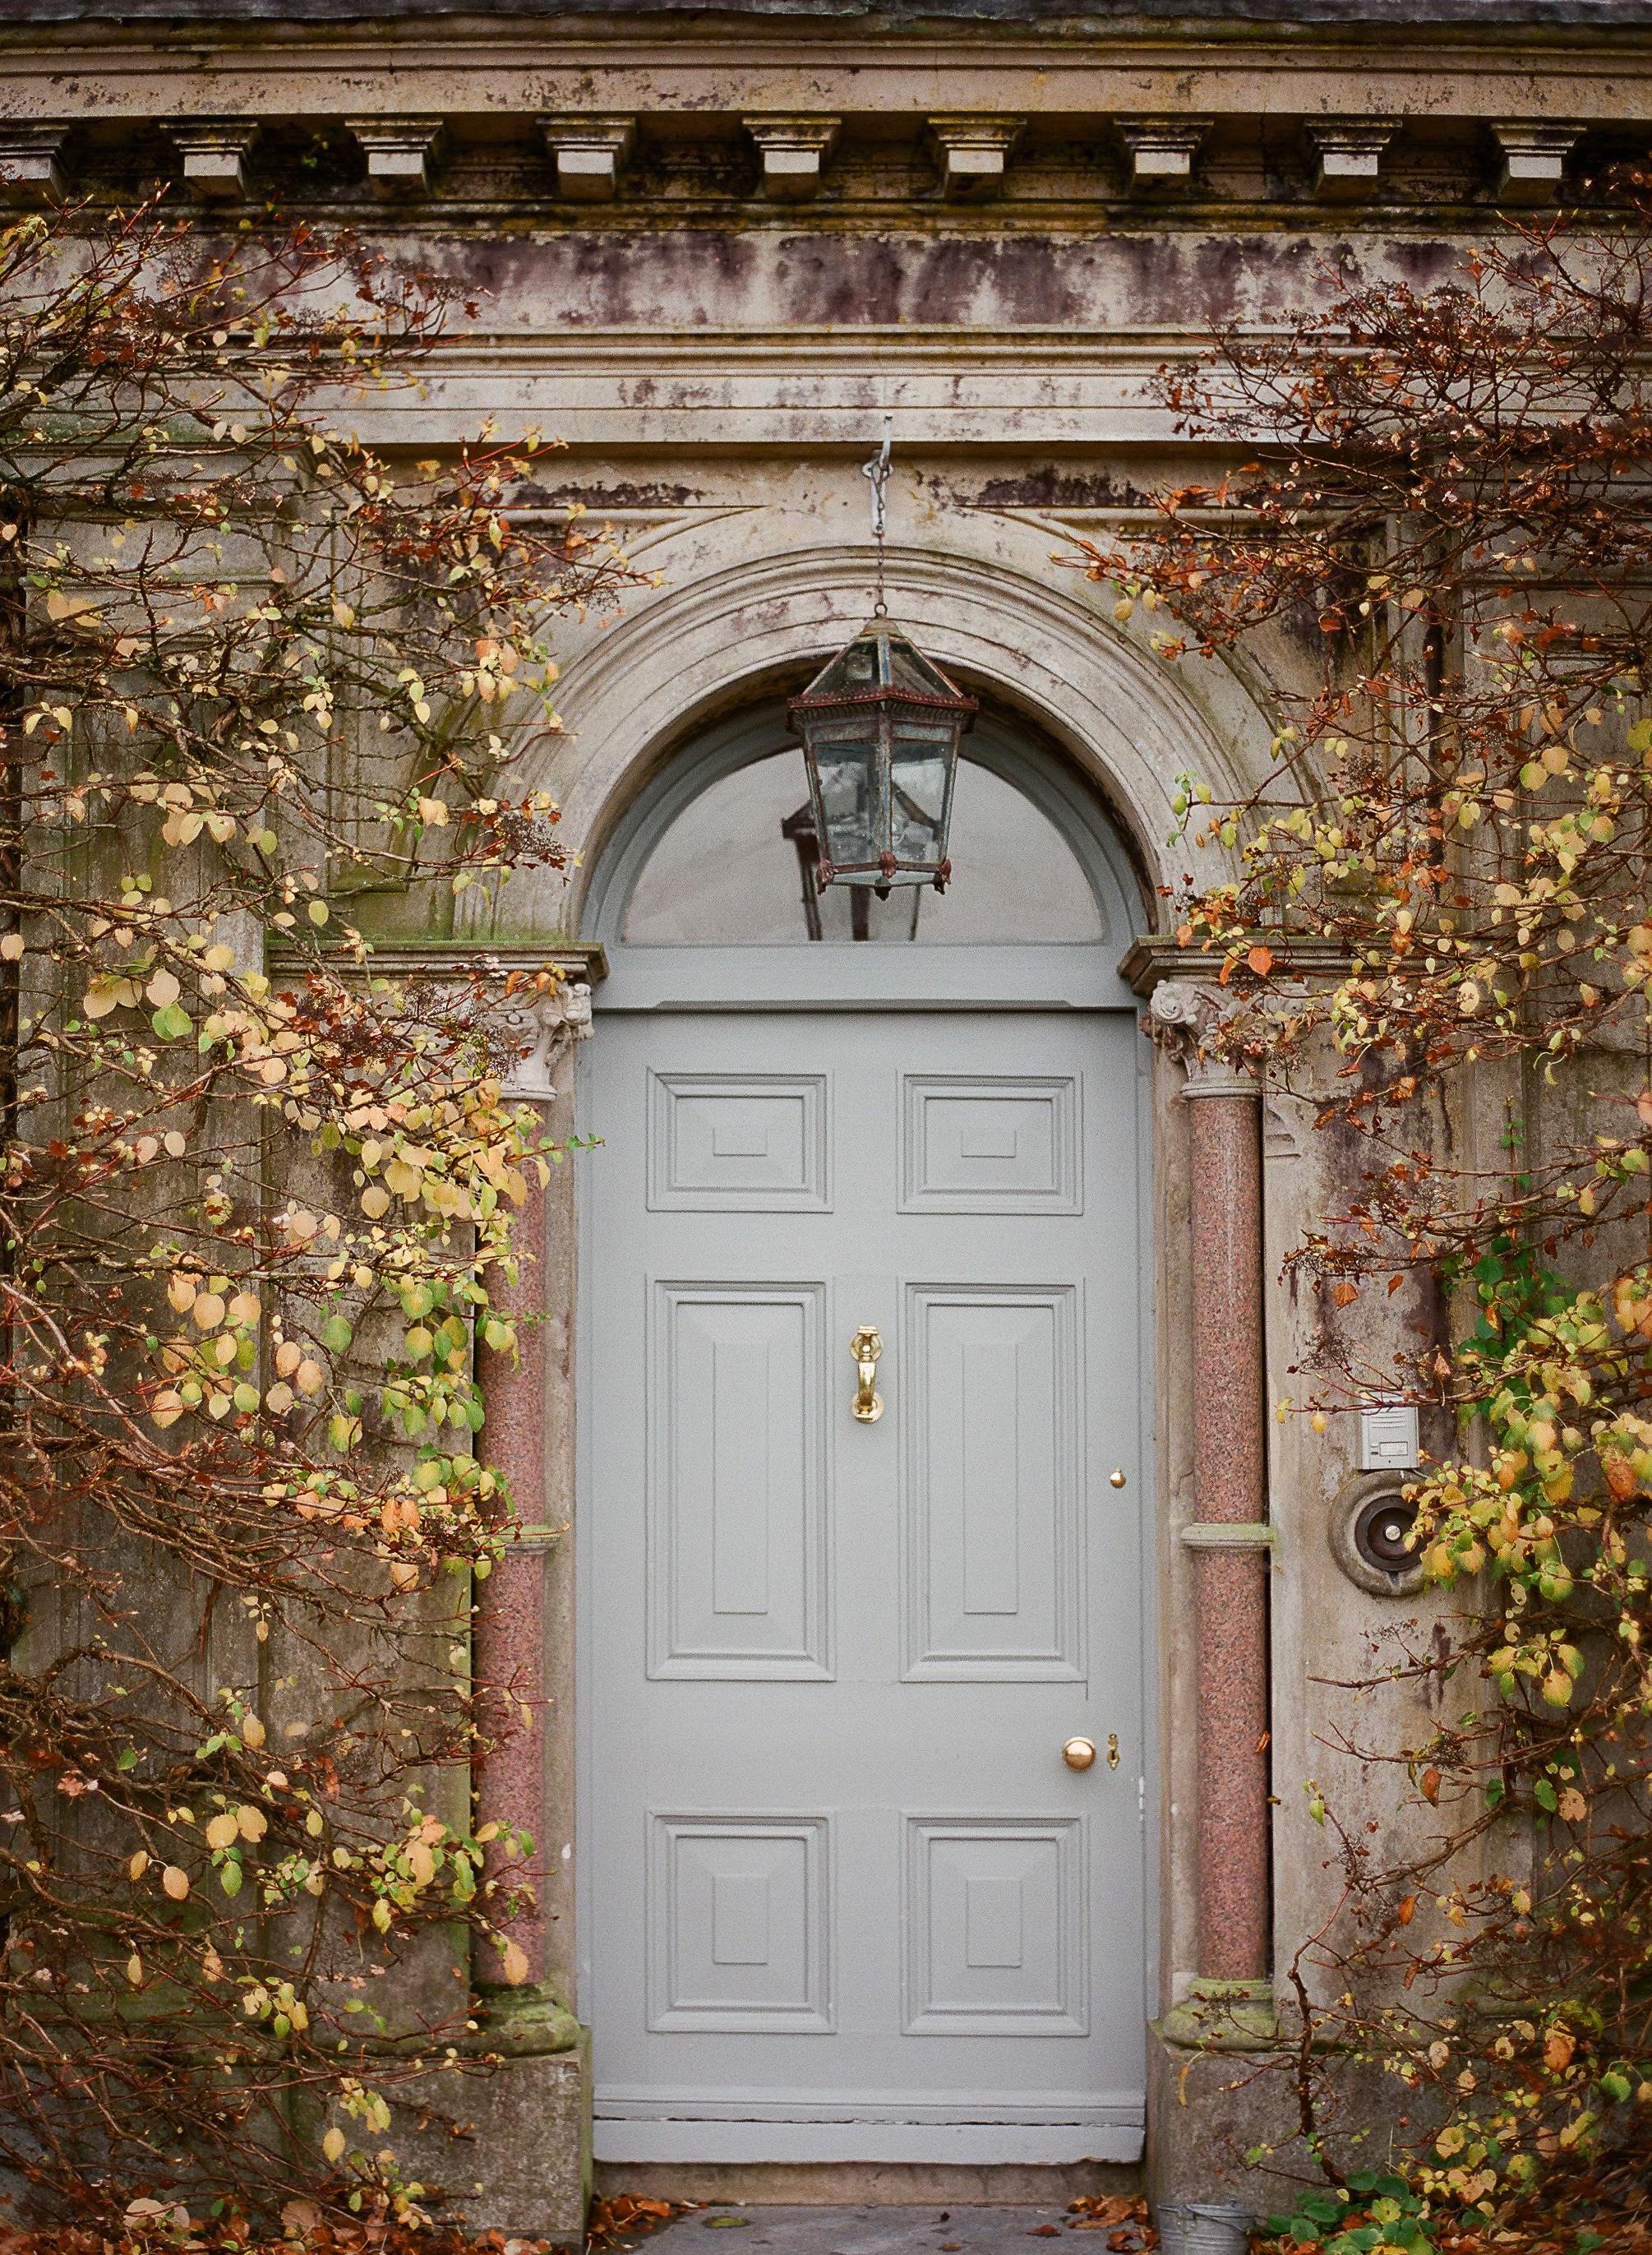 lauramurray-travel-destinationphotography-creativetravel-artists-filmphotography-unearthingtc-door-bluedoor-ballyvolanehouse.jpg